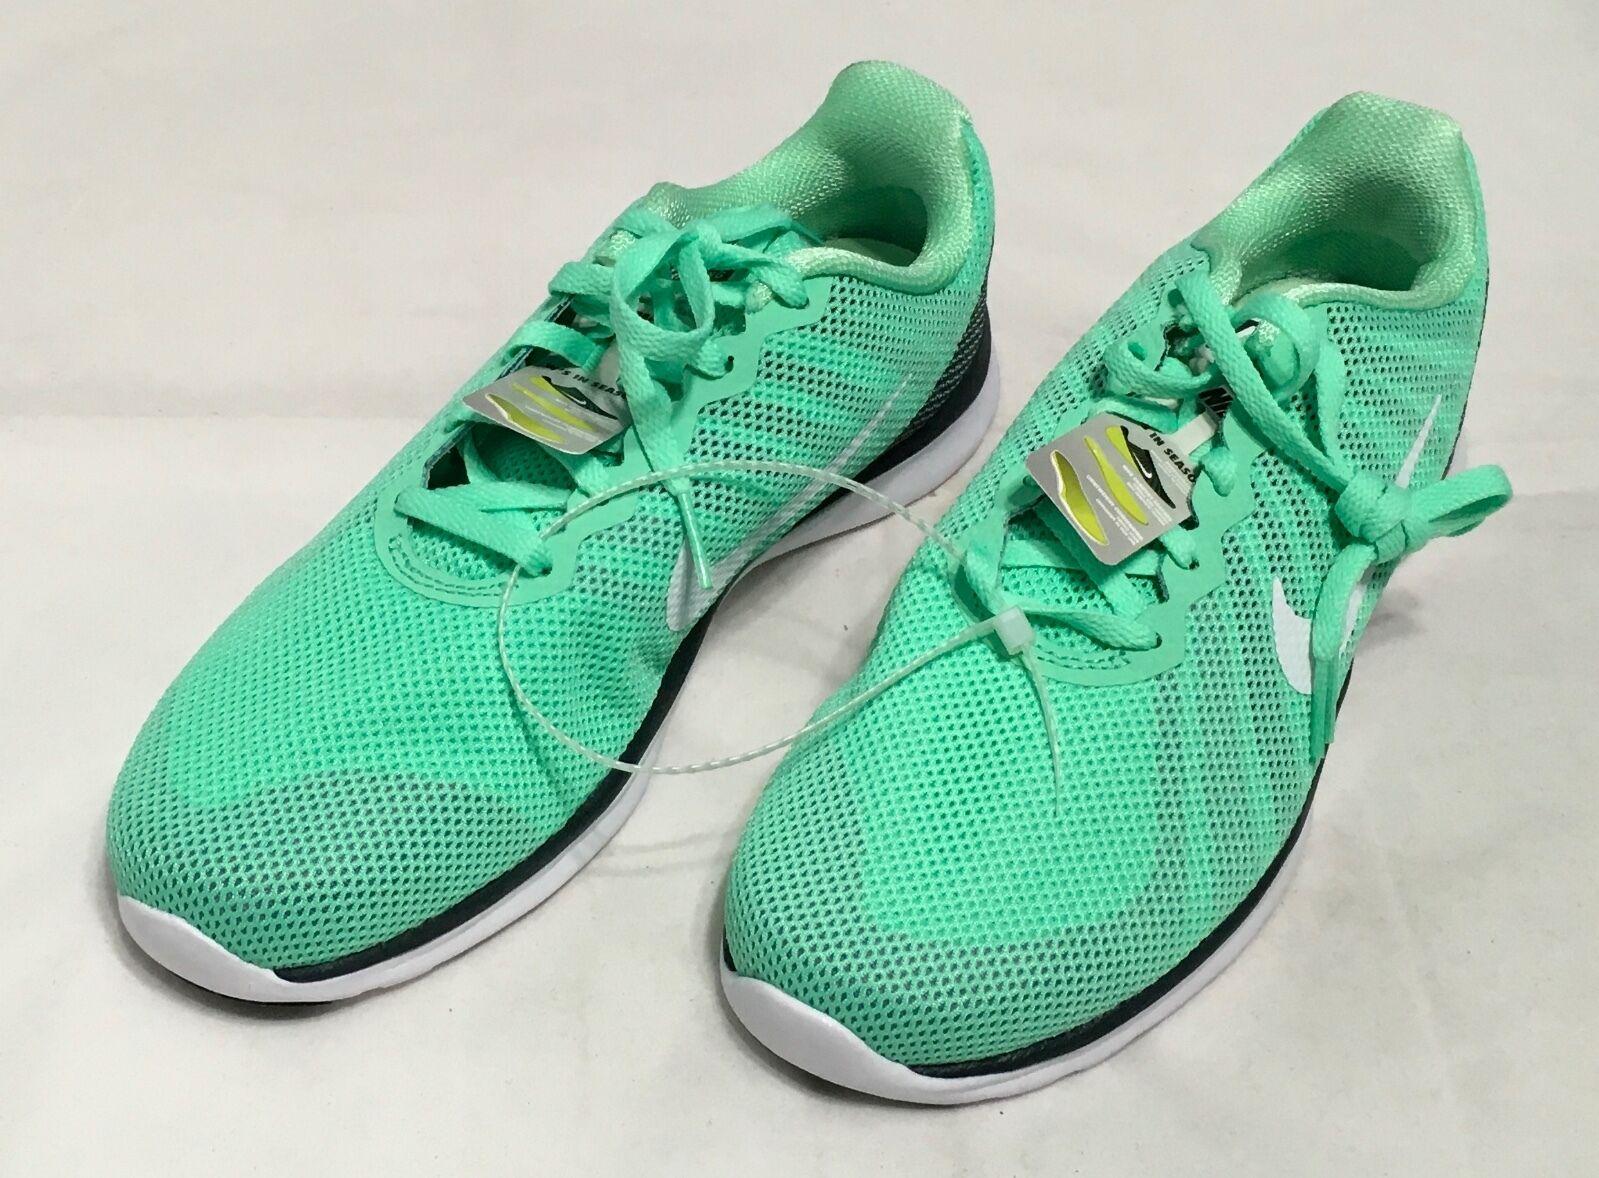 Nike Women's In-Season TR 6 Green/White  Size 8 8 Size NEW! 023f26